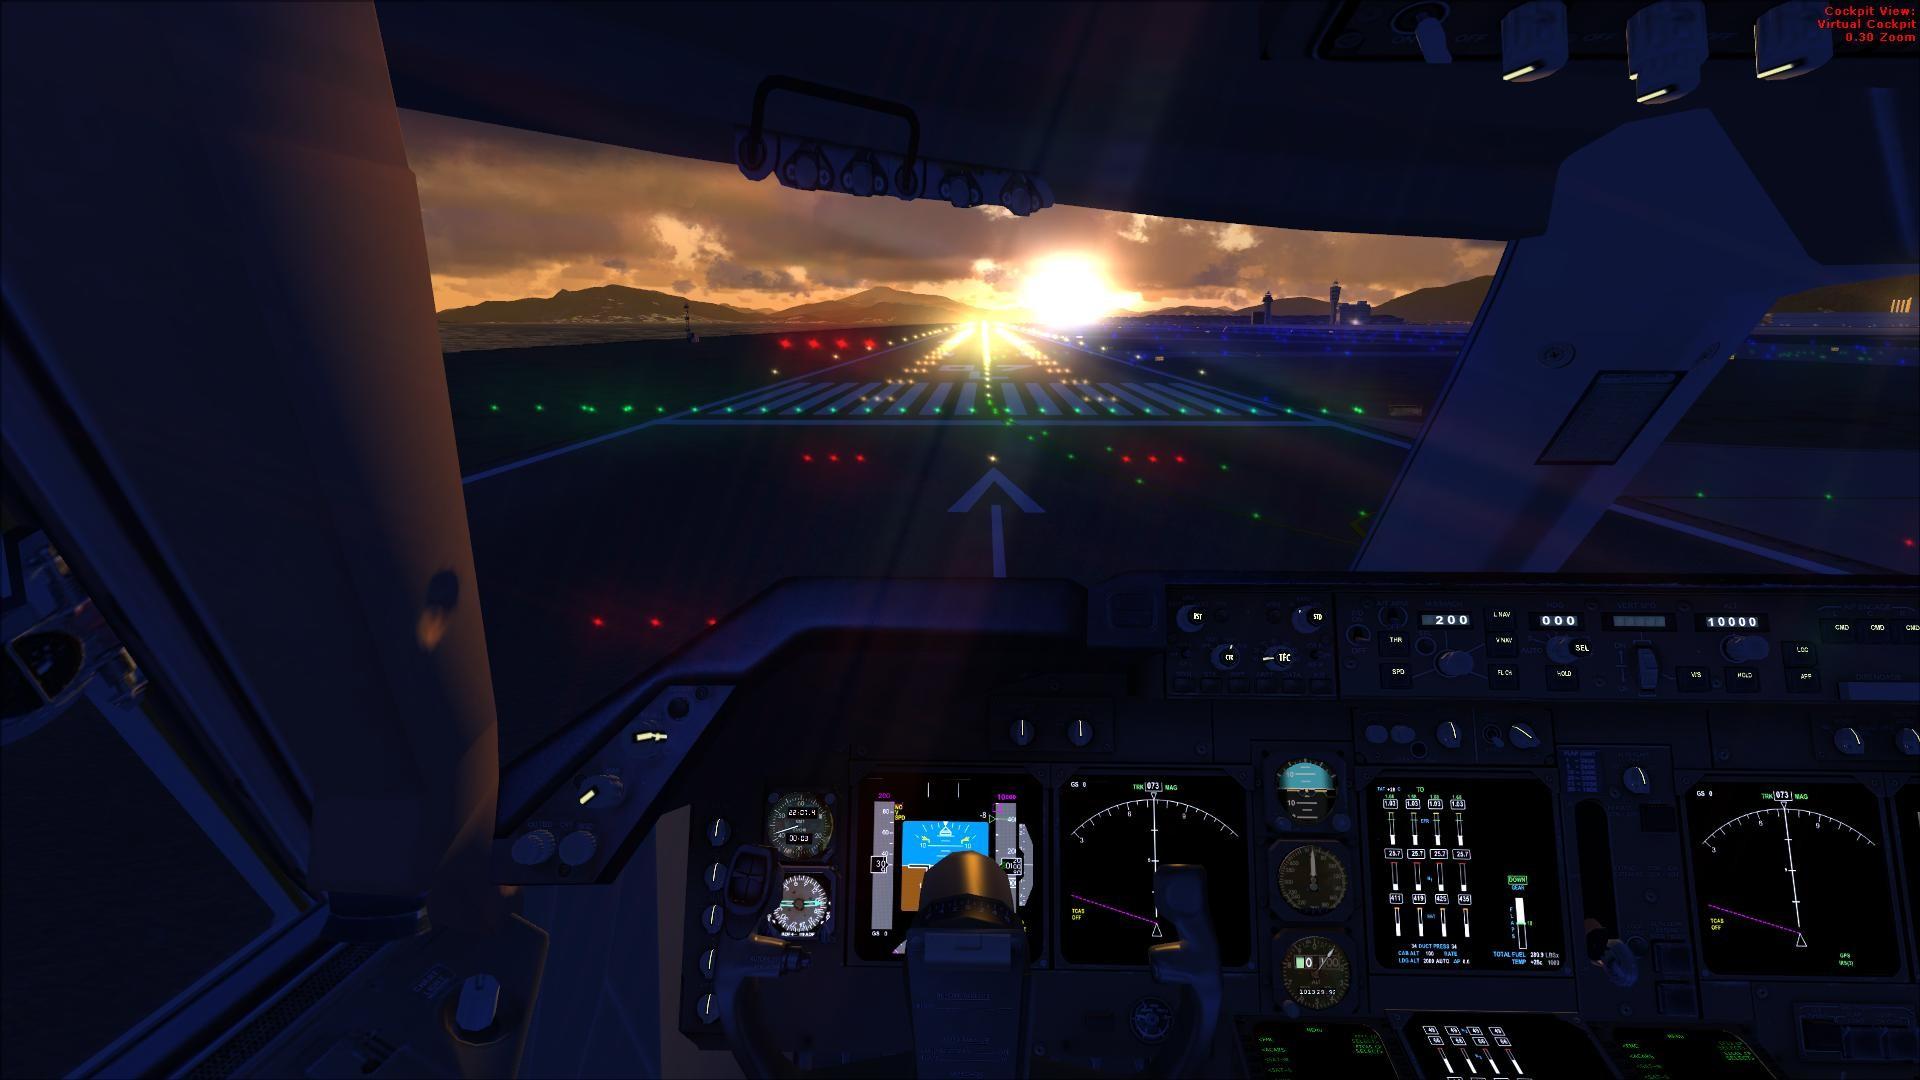 Boeing 737 Cockpit Make A Great Desktop Wallpaper Planes